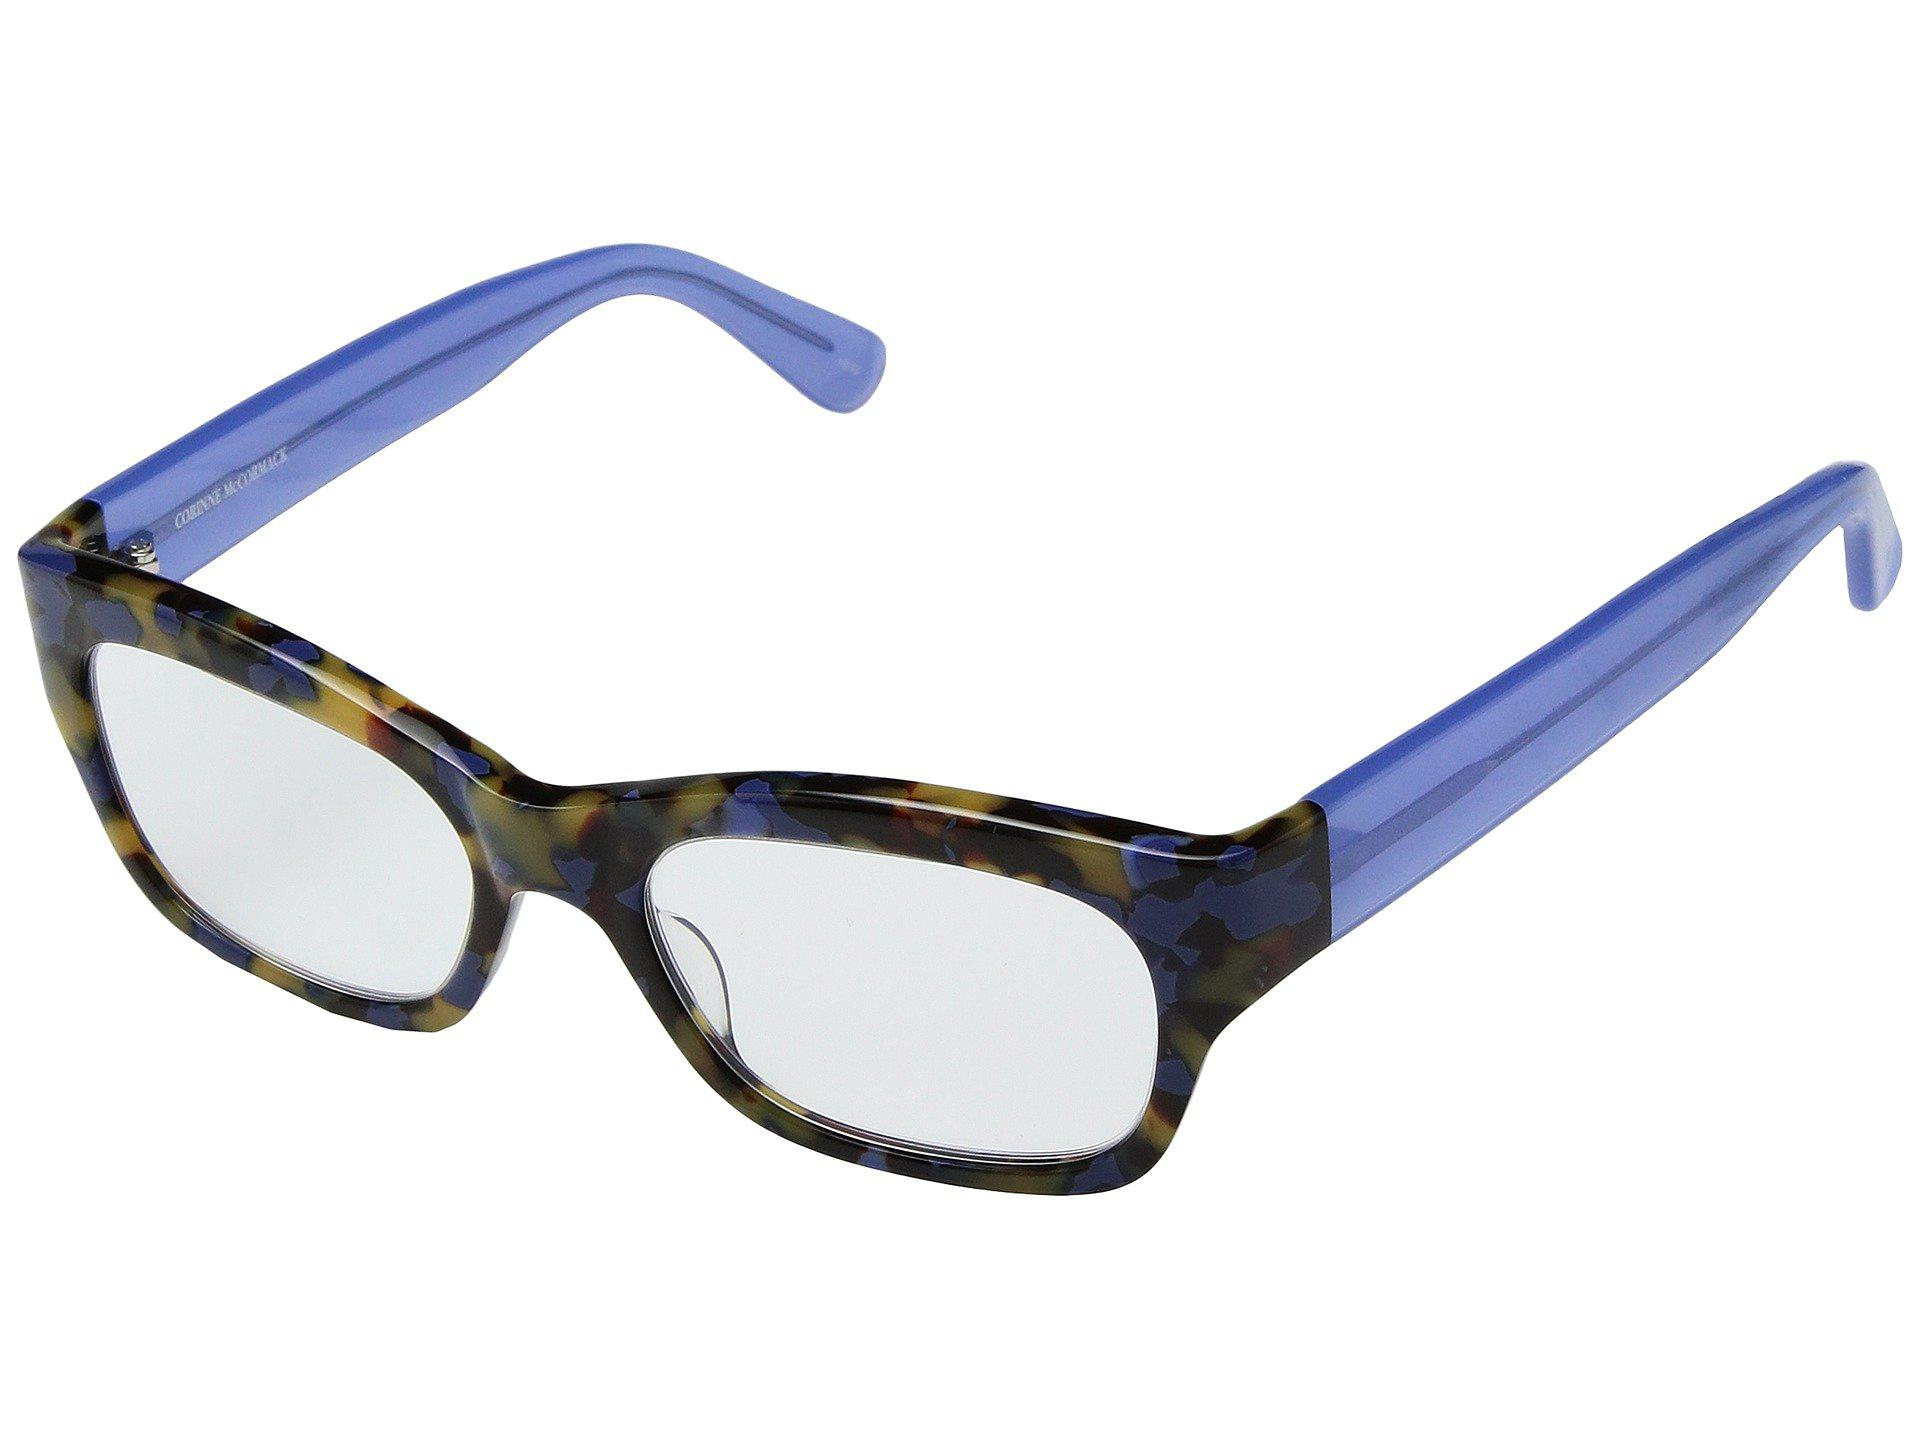 4417783f1dd Corinne Mccormack. Women s Blue Suzy (tortoise) Reading Glasses Sunglasses